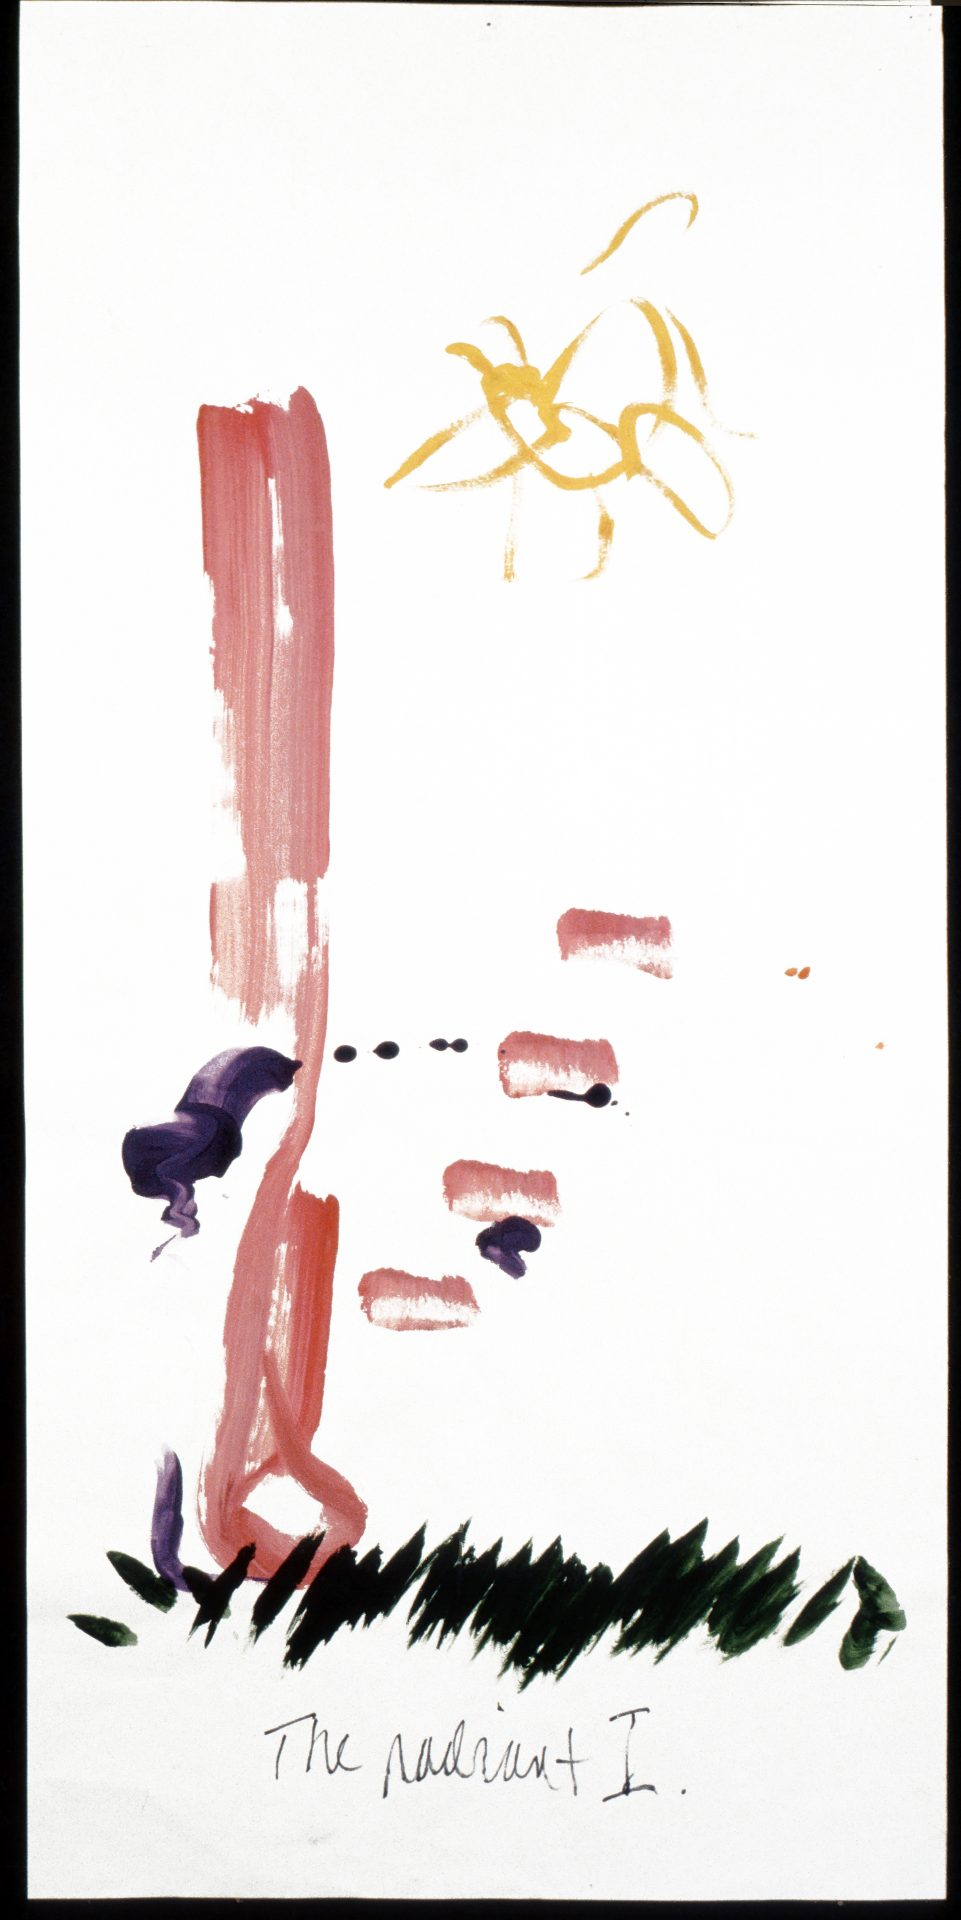 The Radiant I: Paul Edward Pinkman. Tempera on paper.